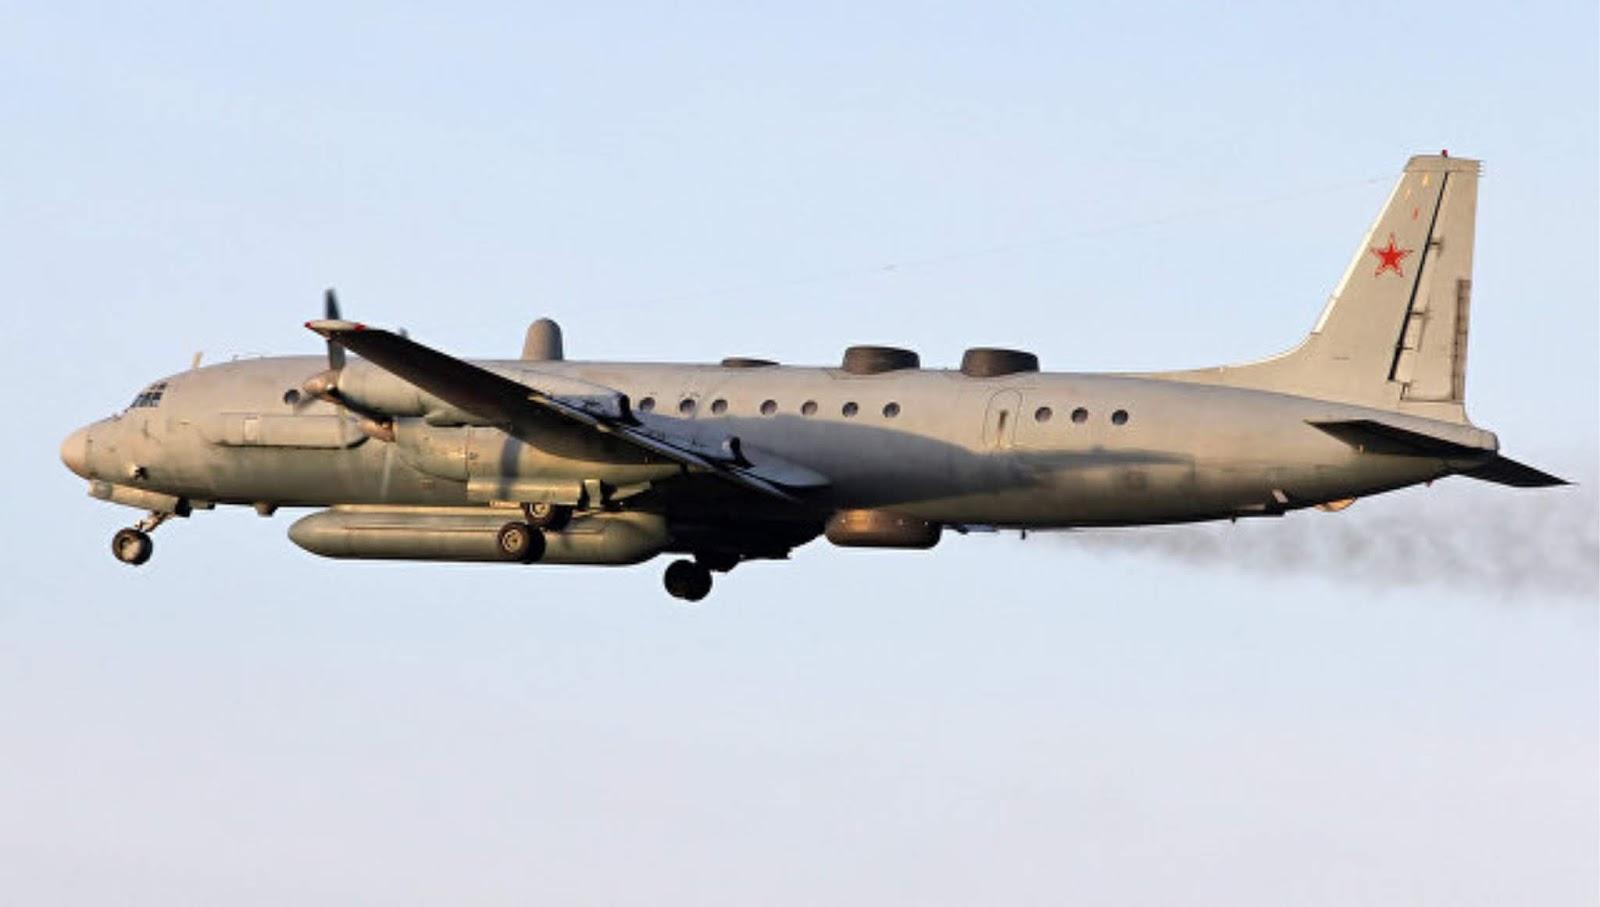 Tanggapan Rusia terhadap jatuhnya Il-20 setelah komandan Israel datang menjelaskan